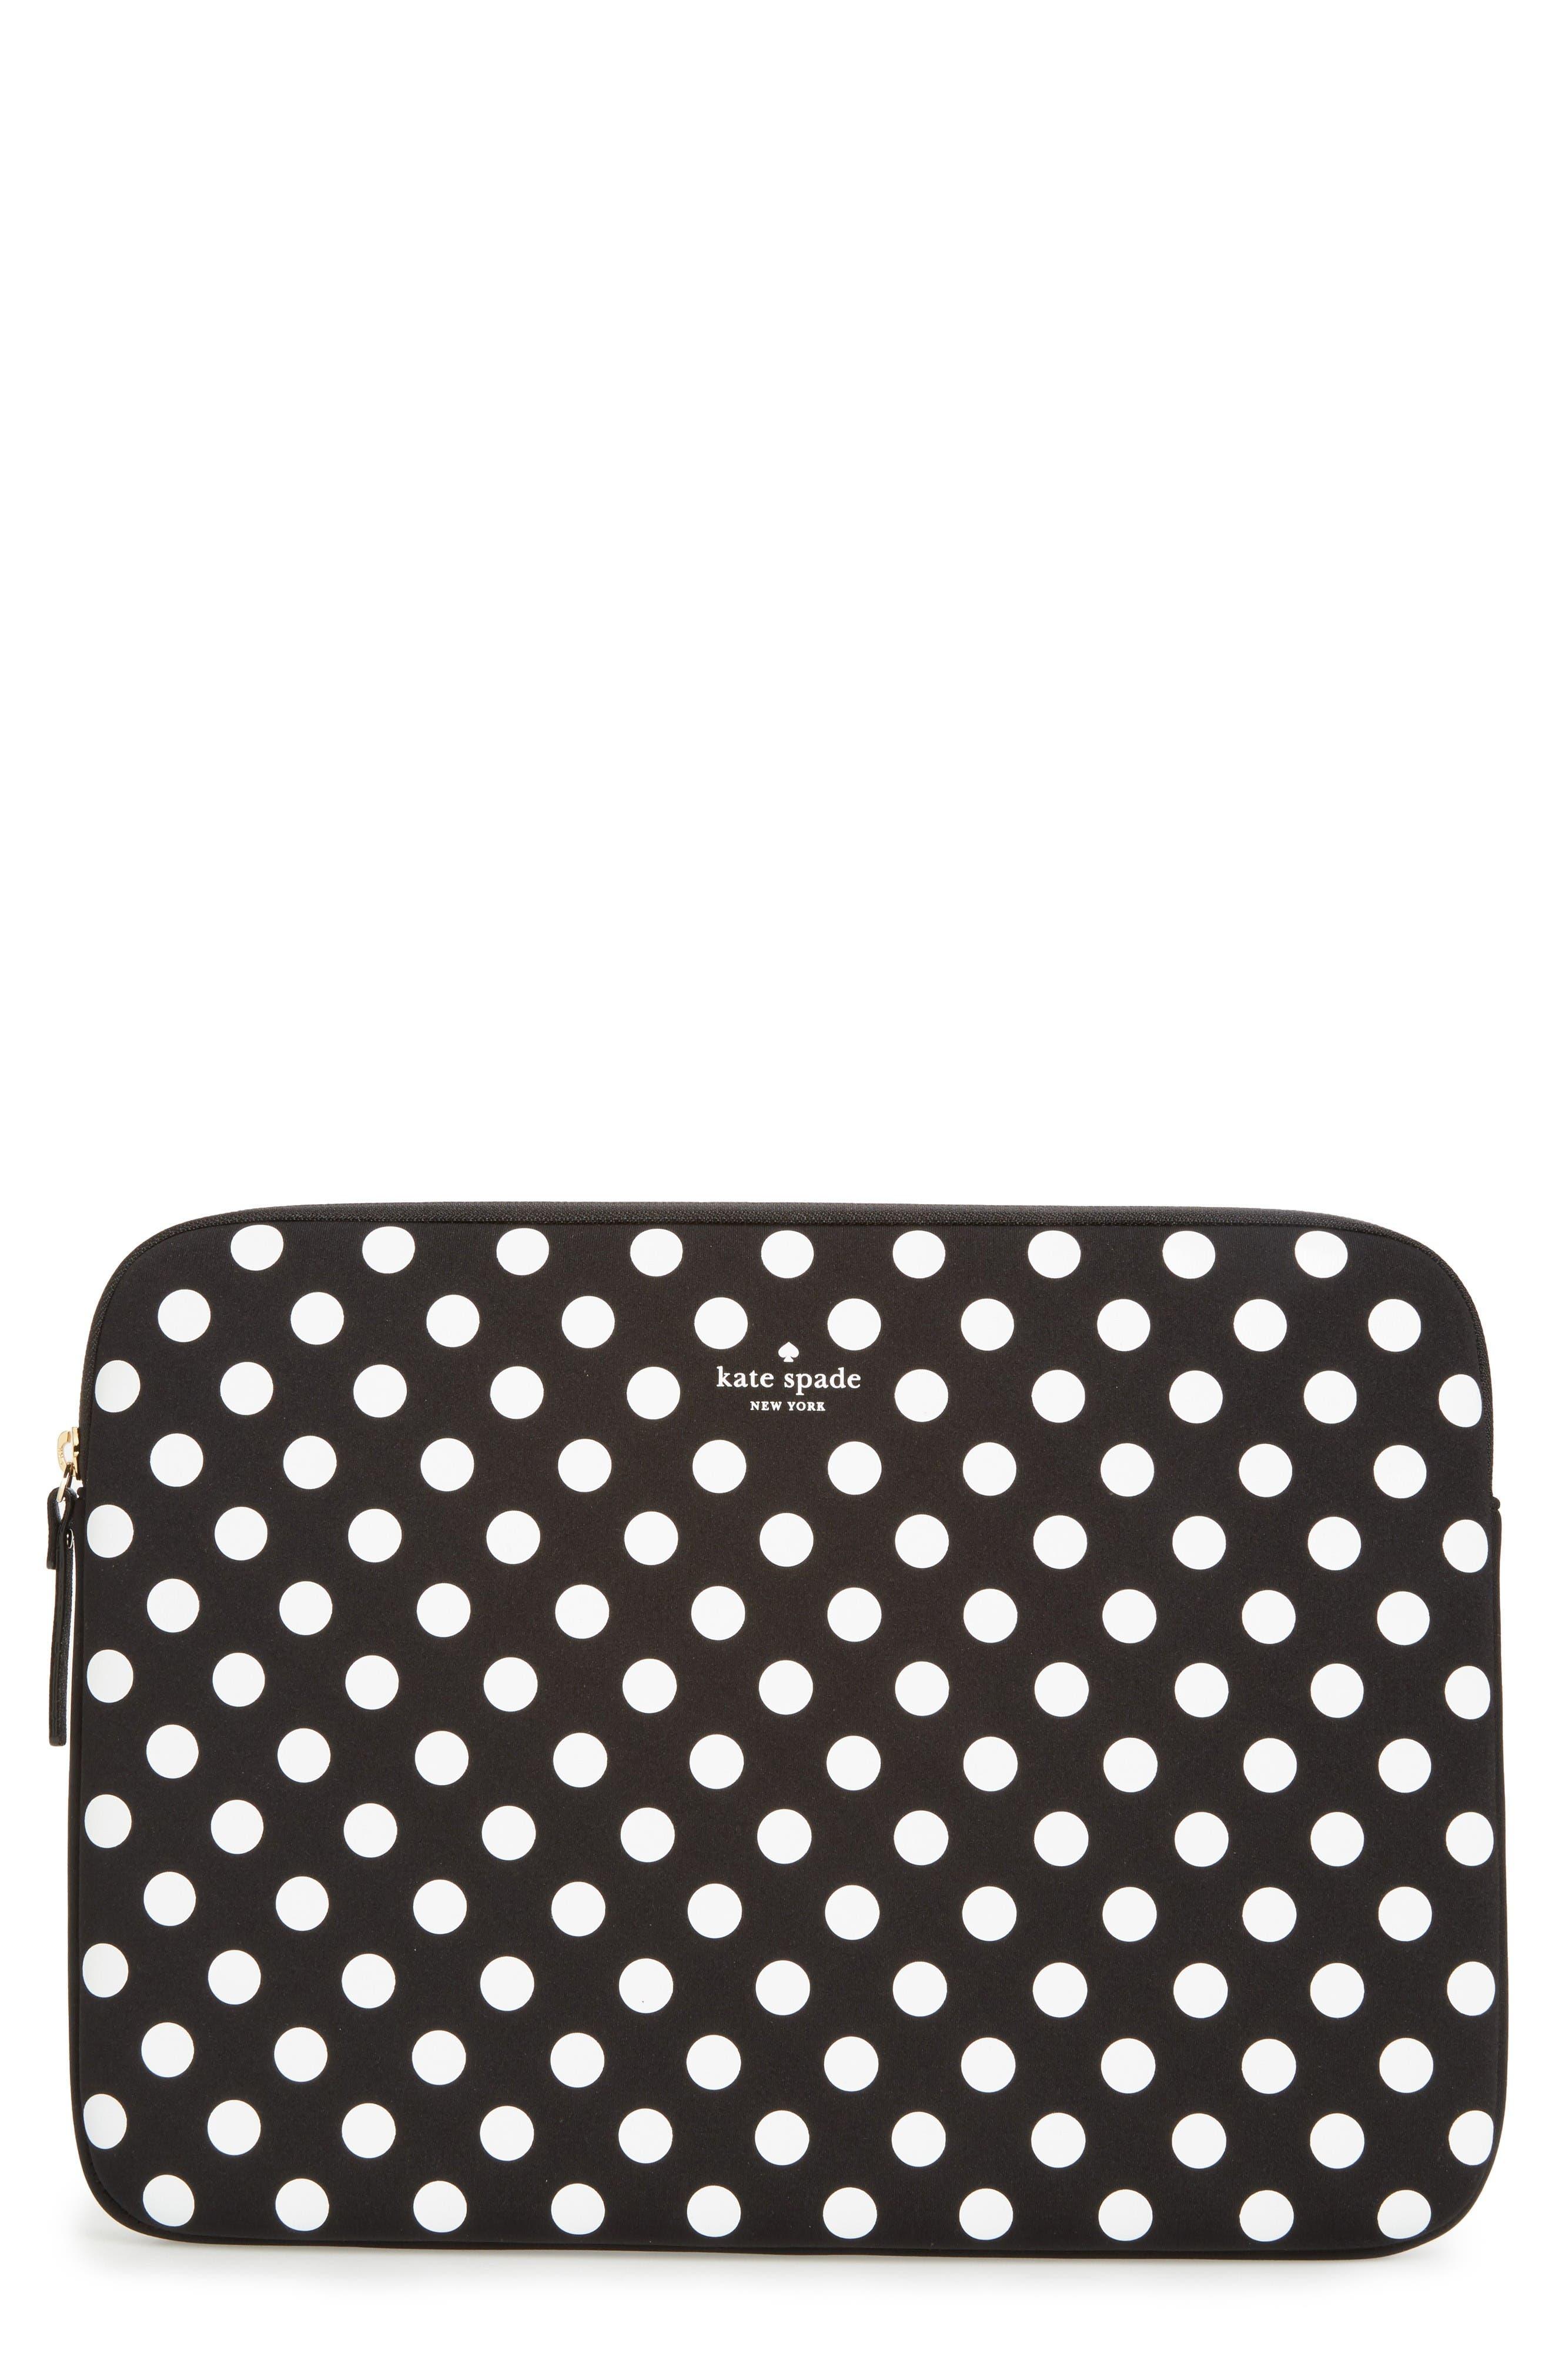 kate spade new york dot 13-inch laptop sleeve